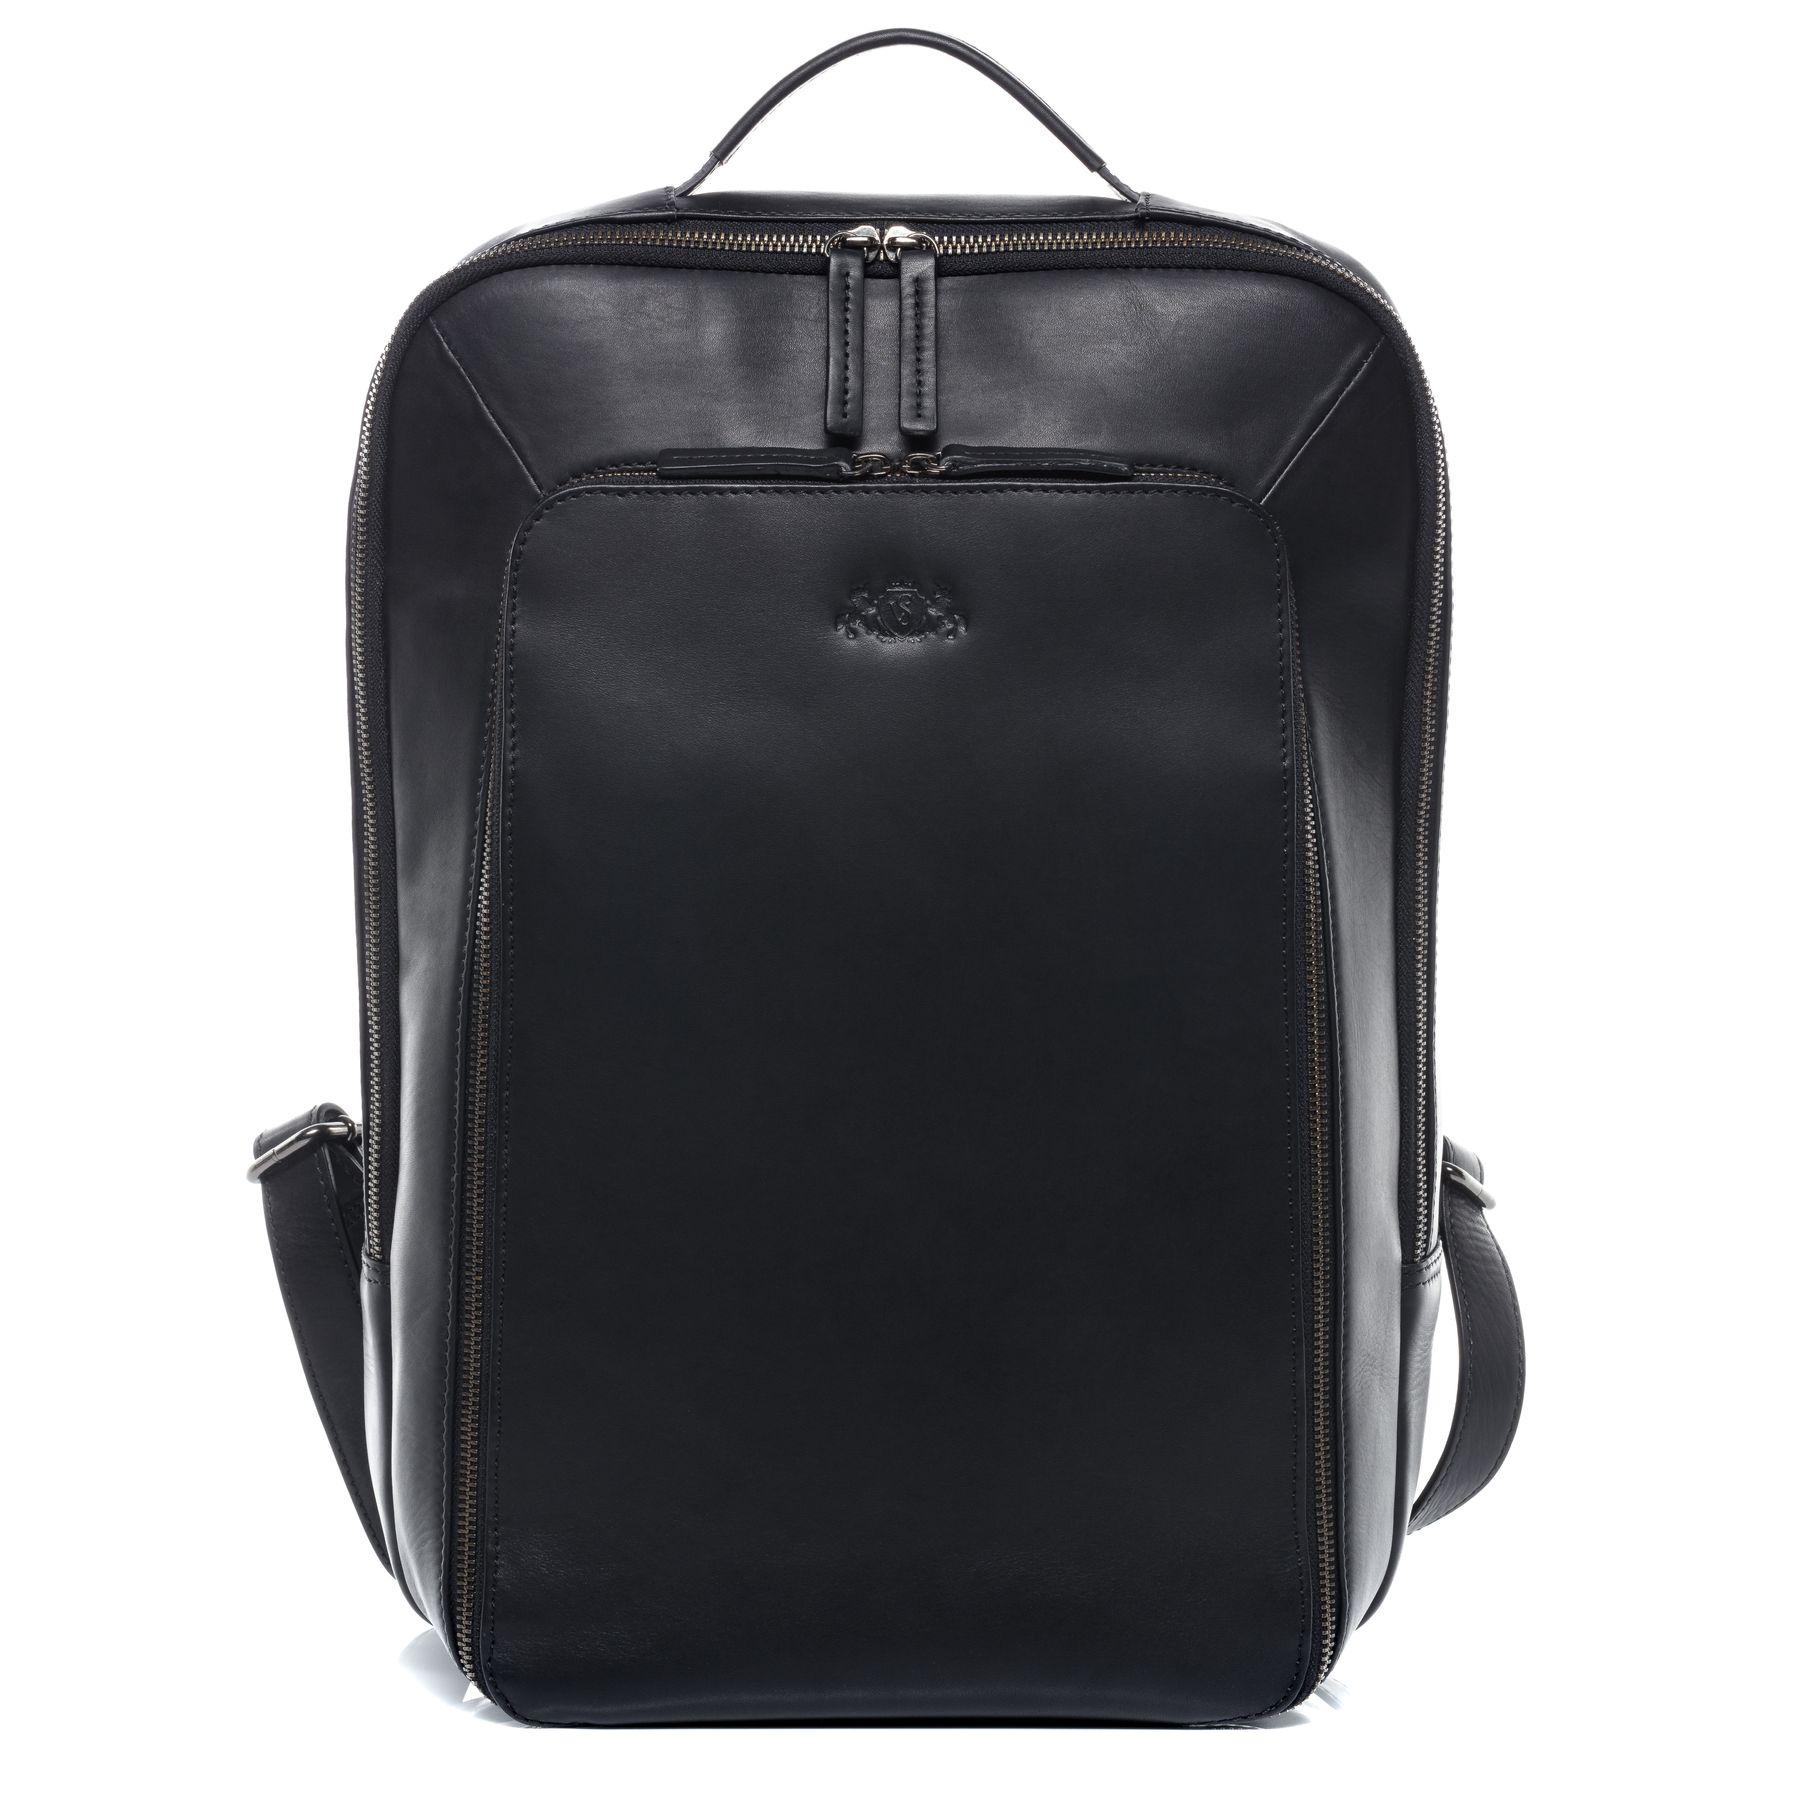 schwarzer Lederrucksack Laptoprucksack